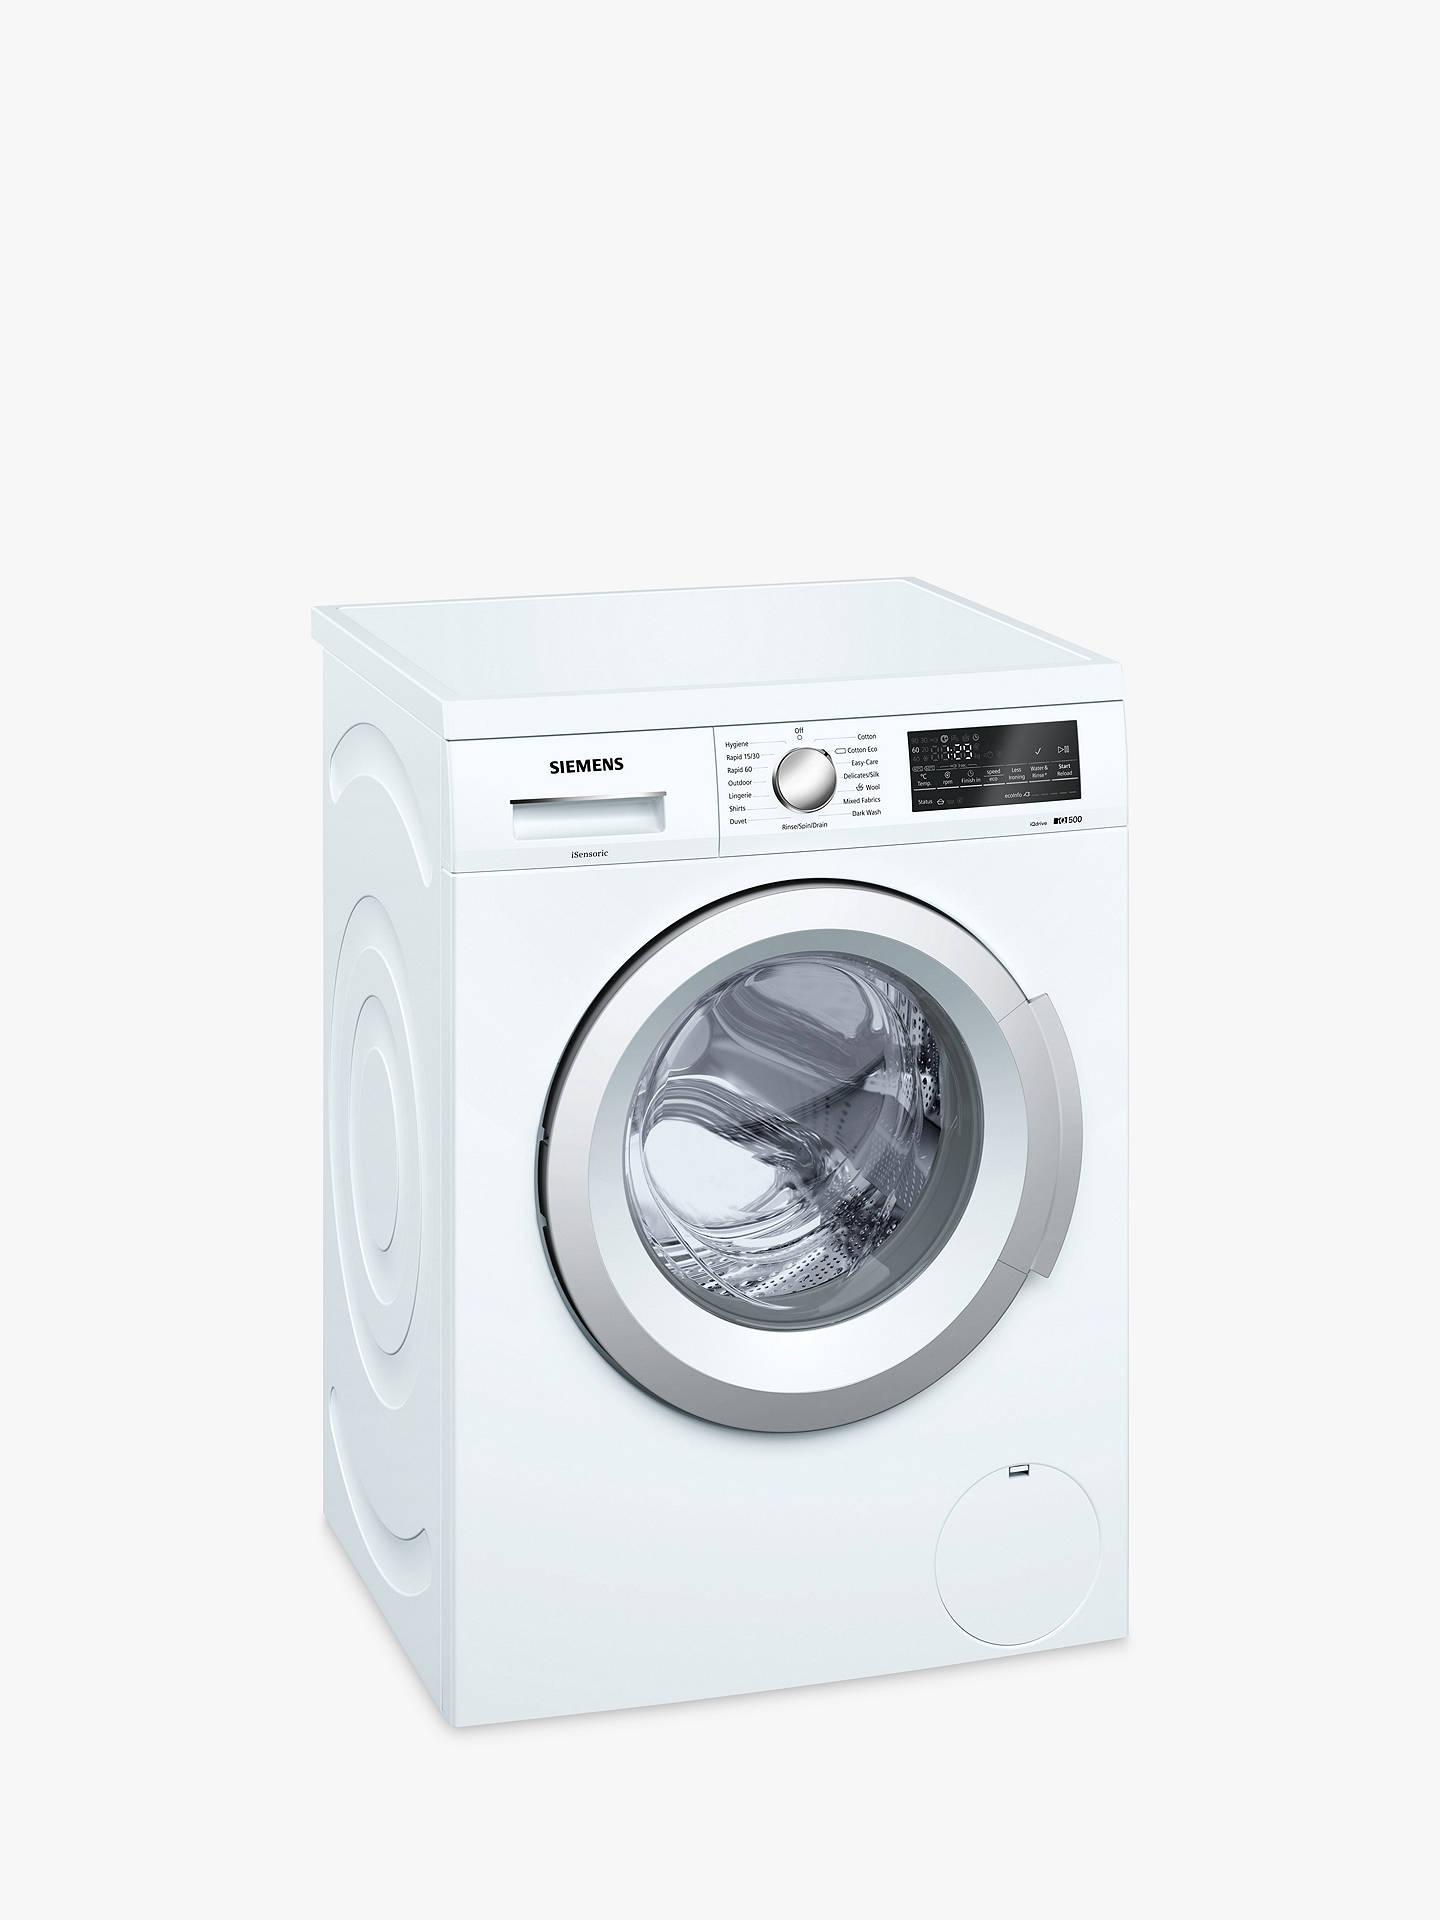 Siemens Wu14q420gb Freestanding Washing Machine 8kg Load A Wiring Diagram Buysiemens Energy Rating 1400rpm Spin